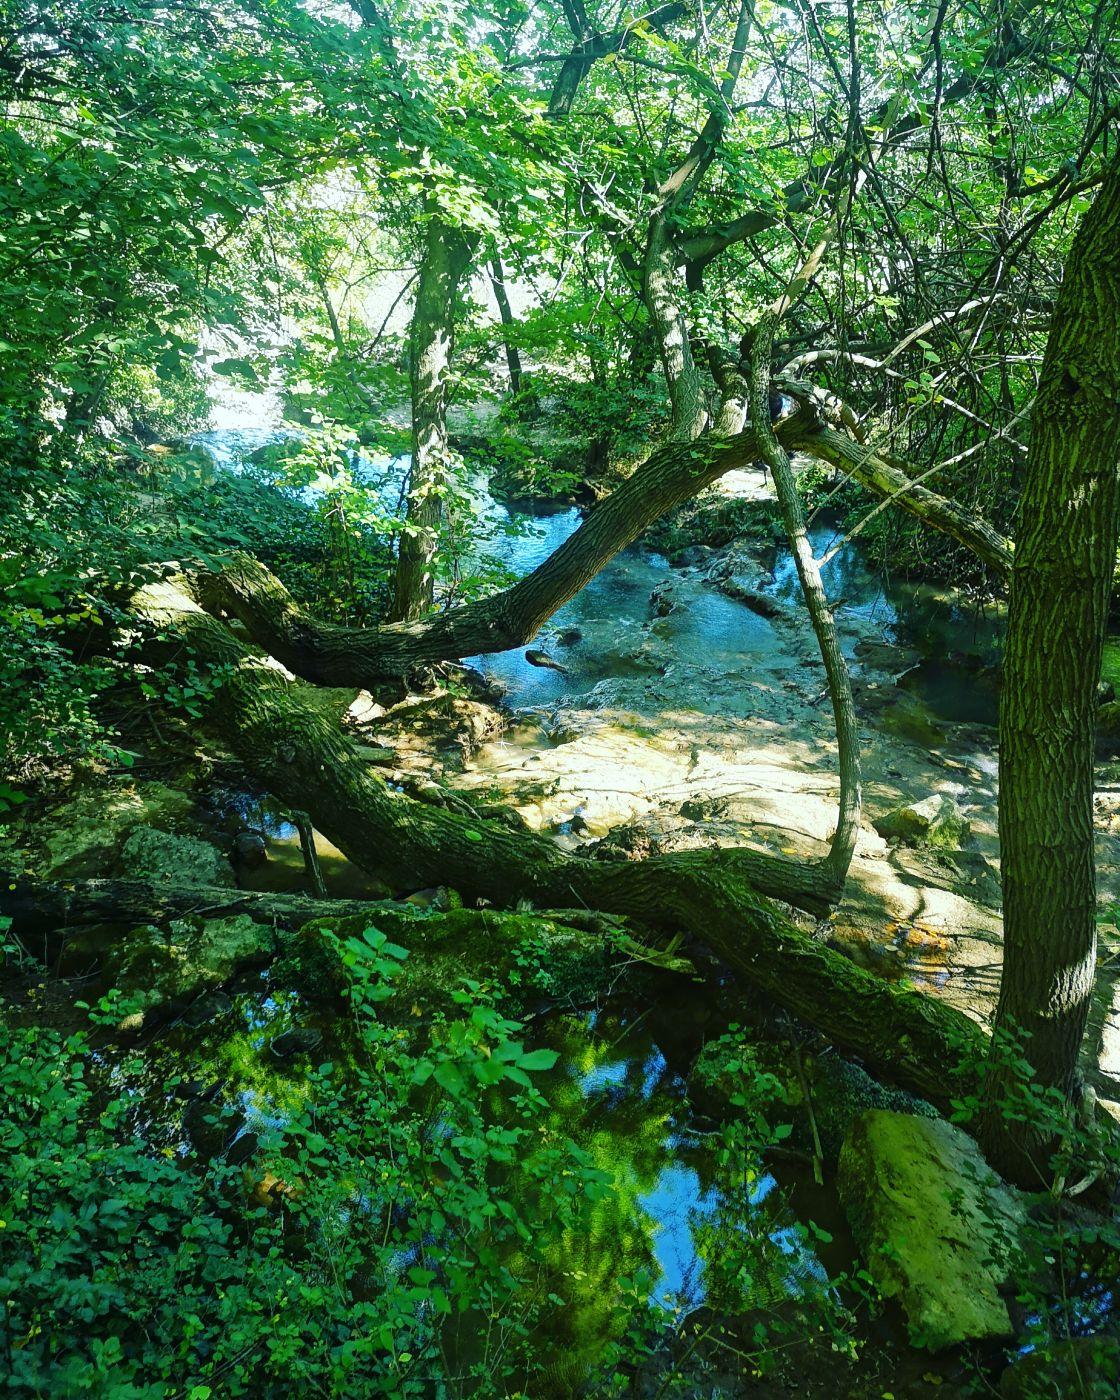 Hotnitsa Waterfall & Canyon, Bulgaria